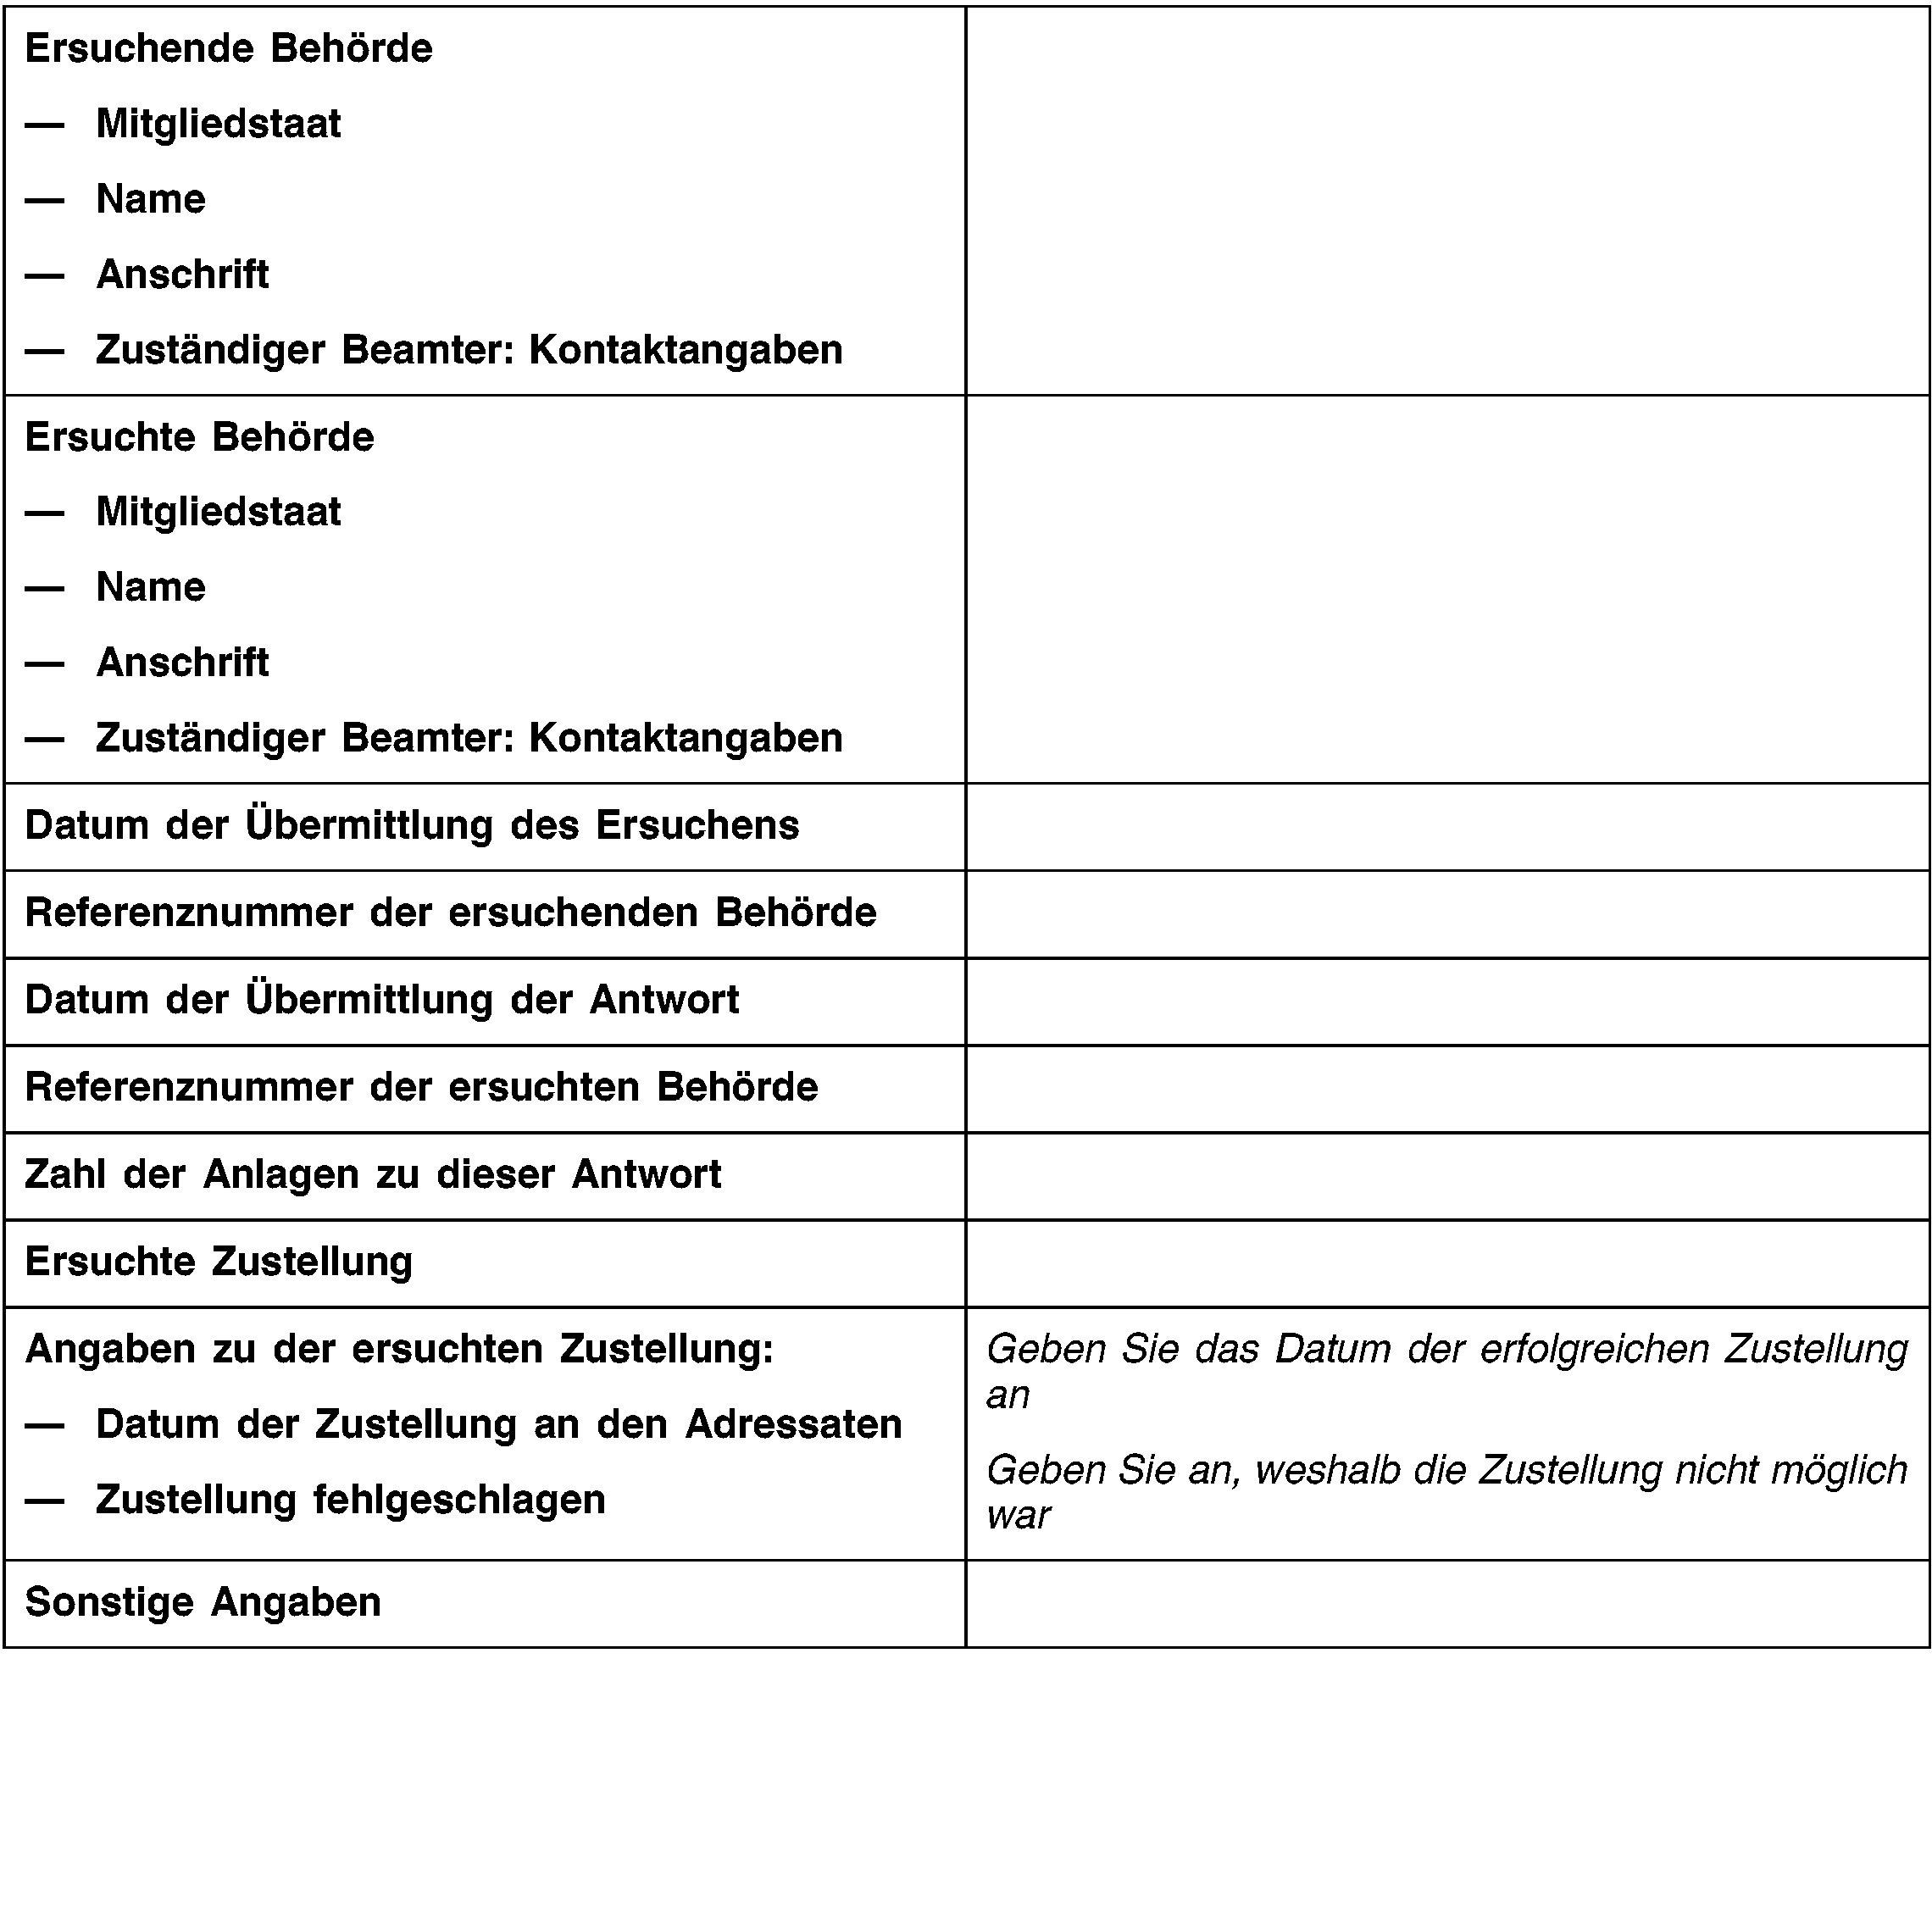 Berühmt Lastschriftformular Vorlage Fotos - Entry Level Resume ...